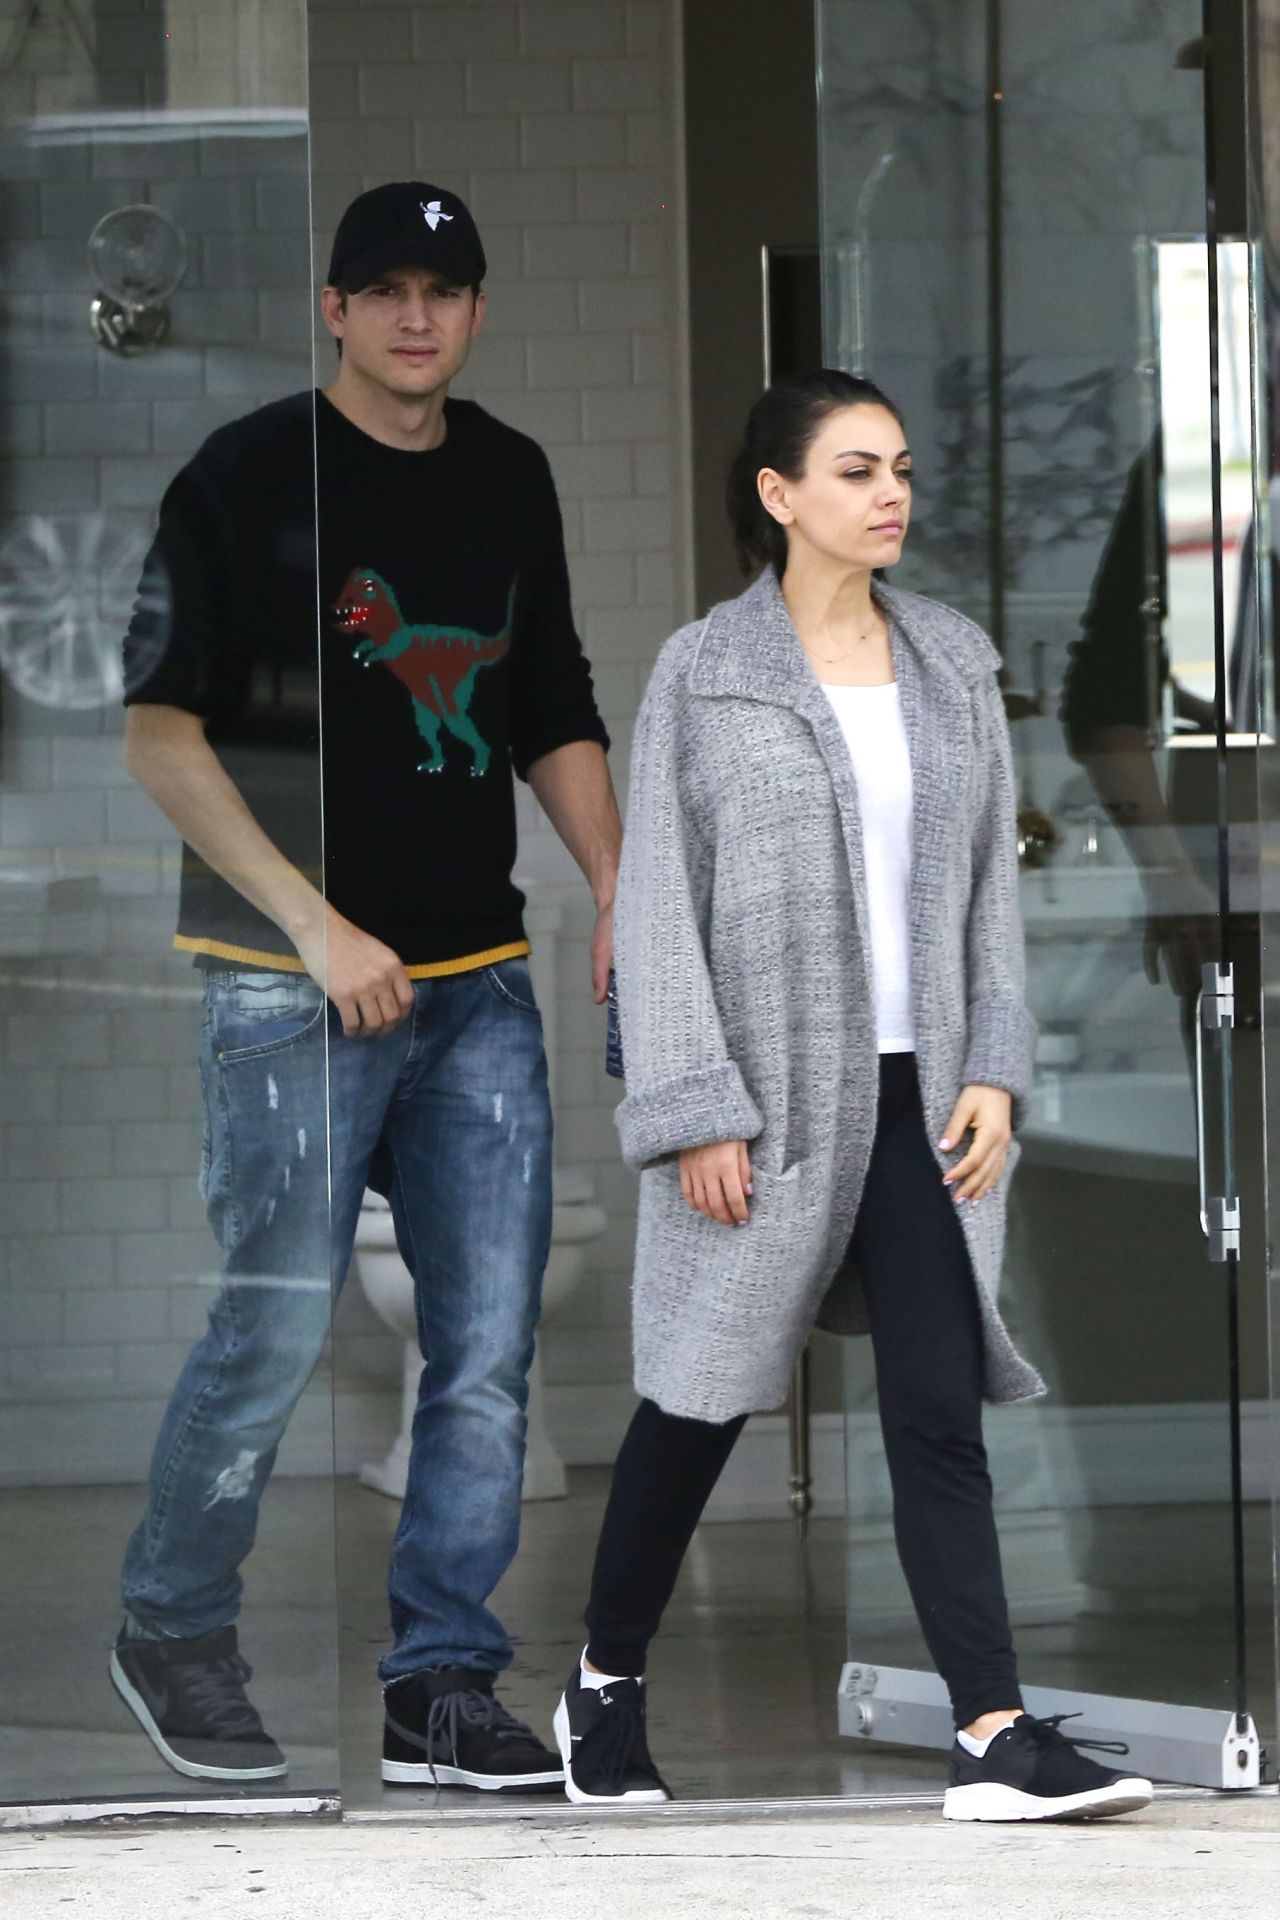 mila kunis and ashton kutcher shopping in la 03232018